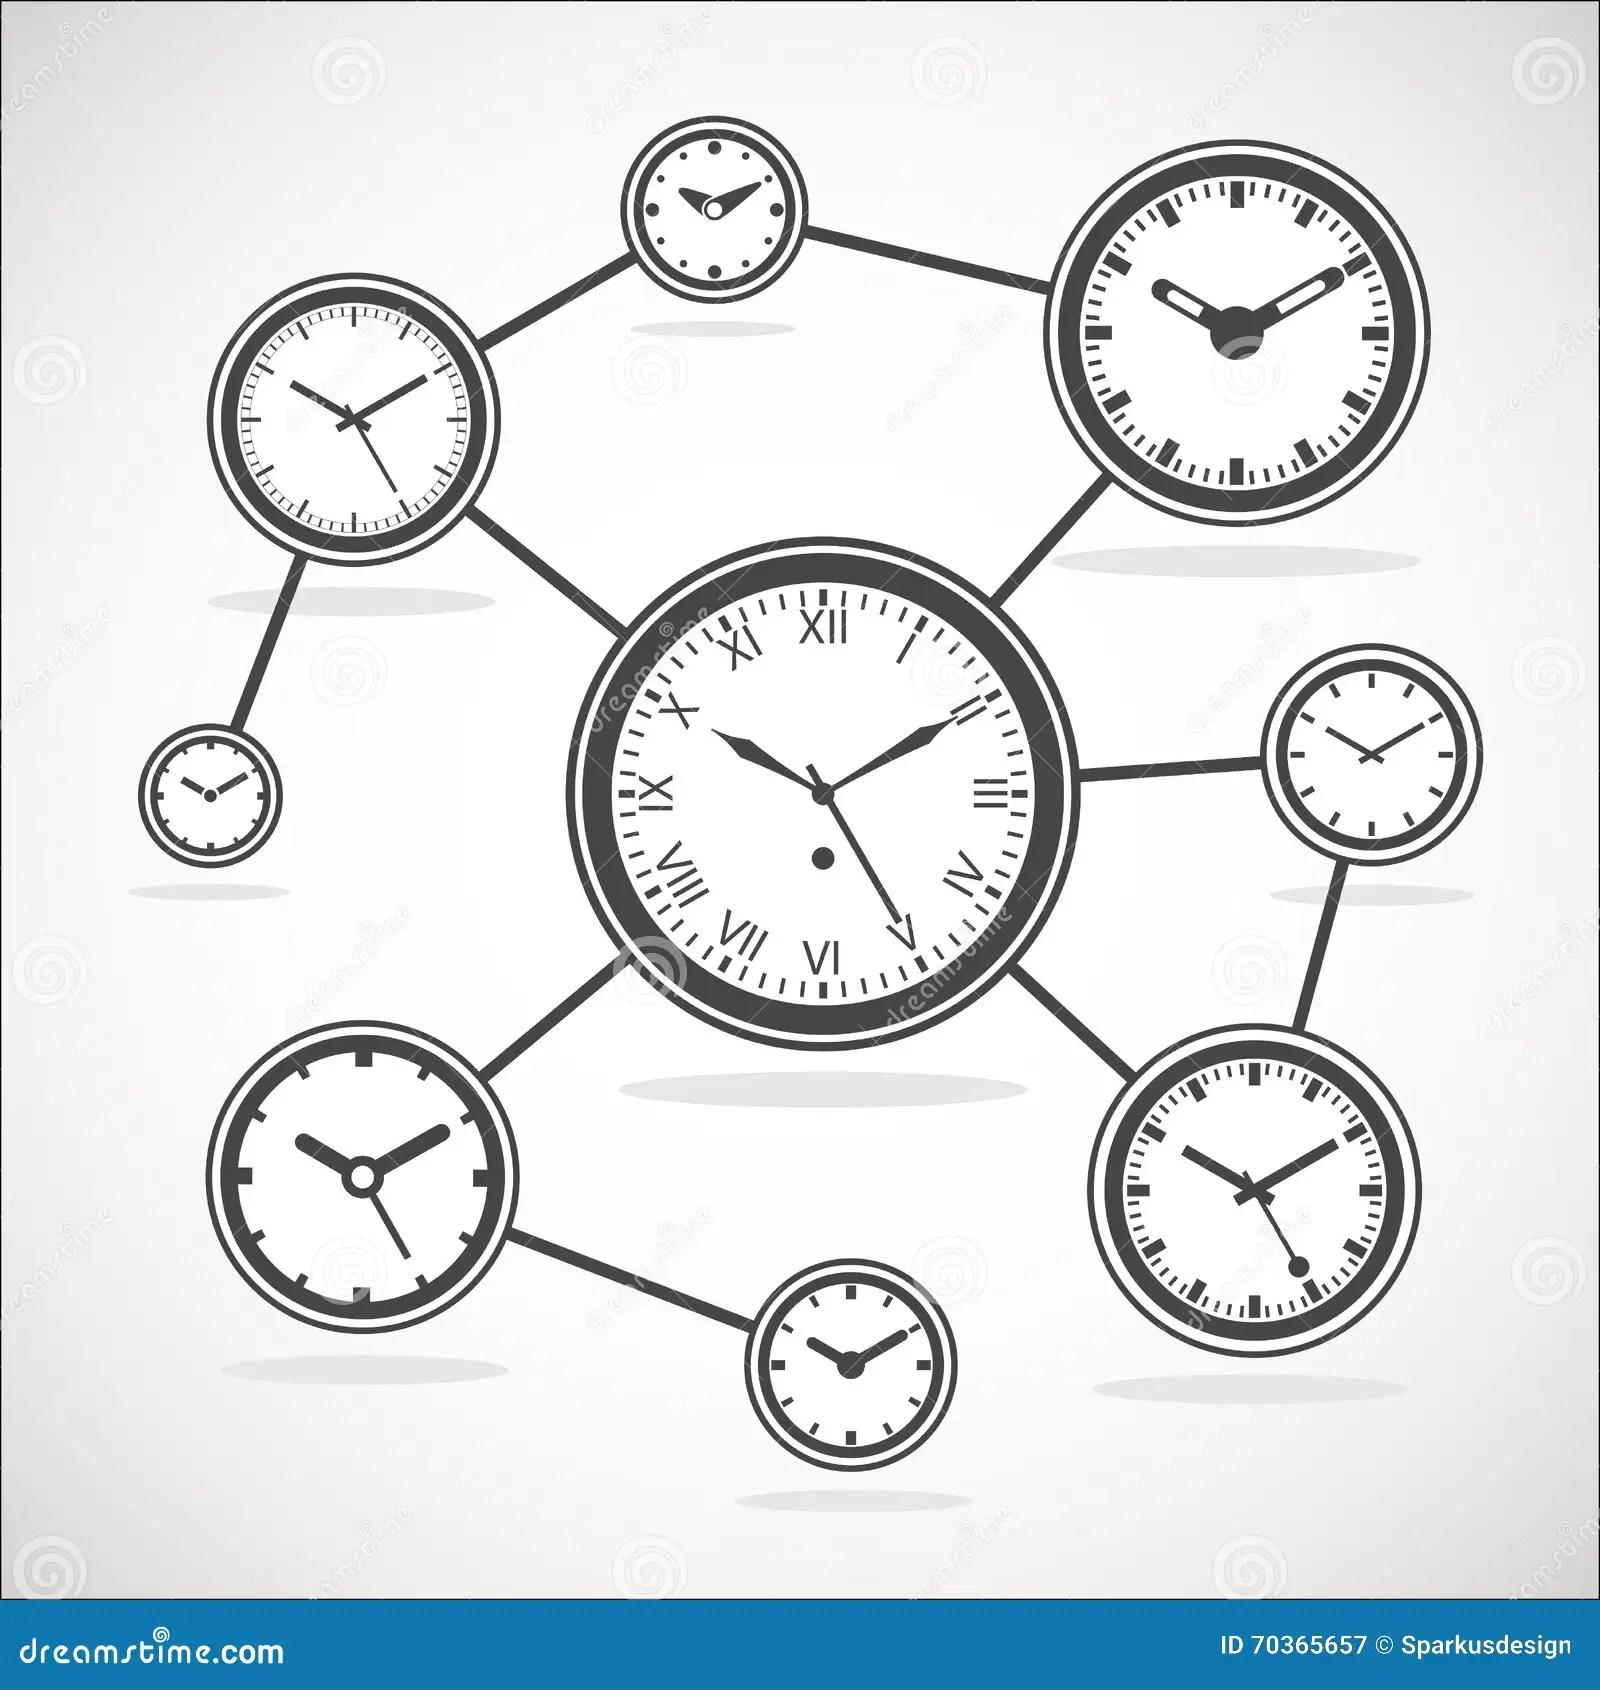 Time Synchronization Diagram